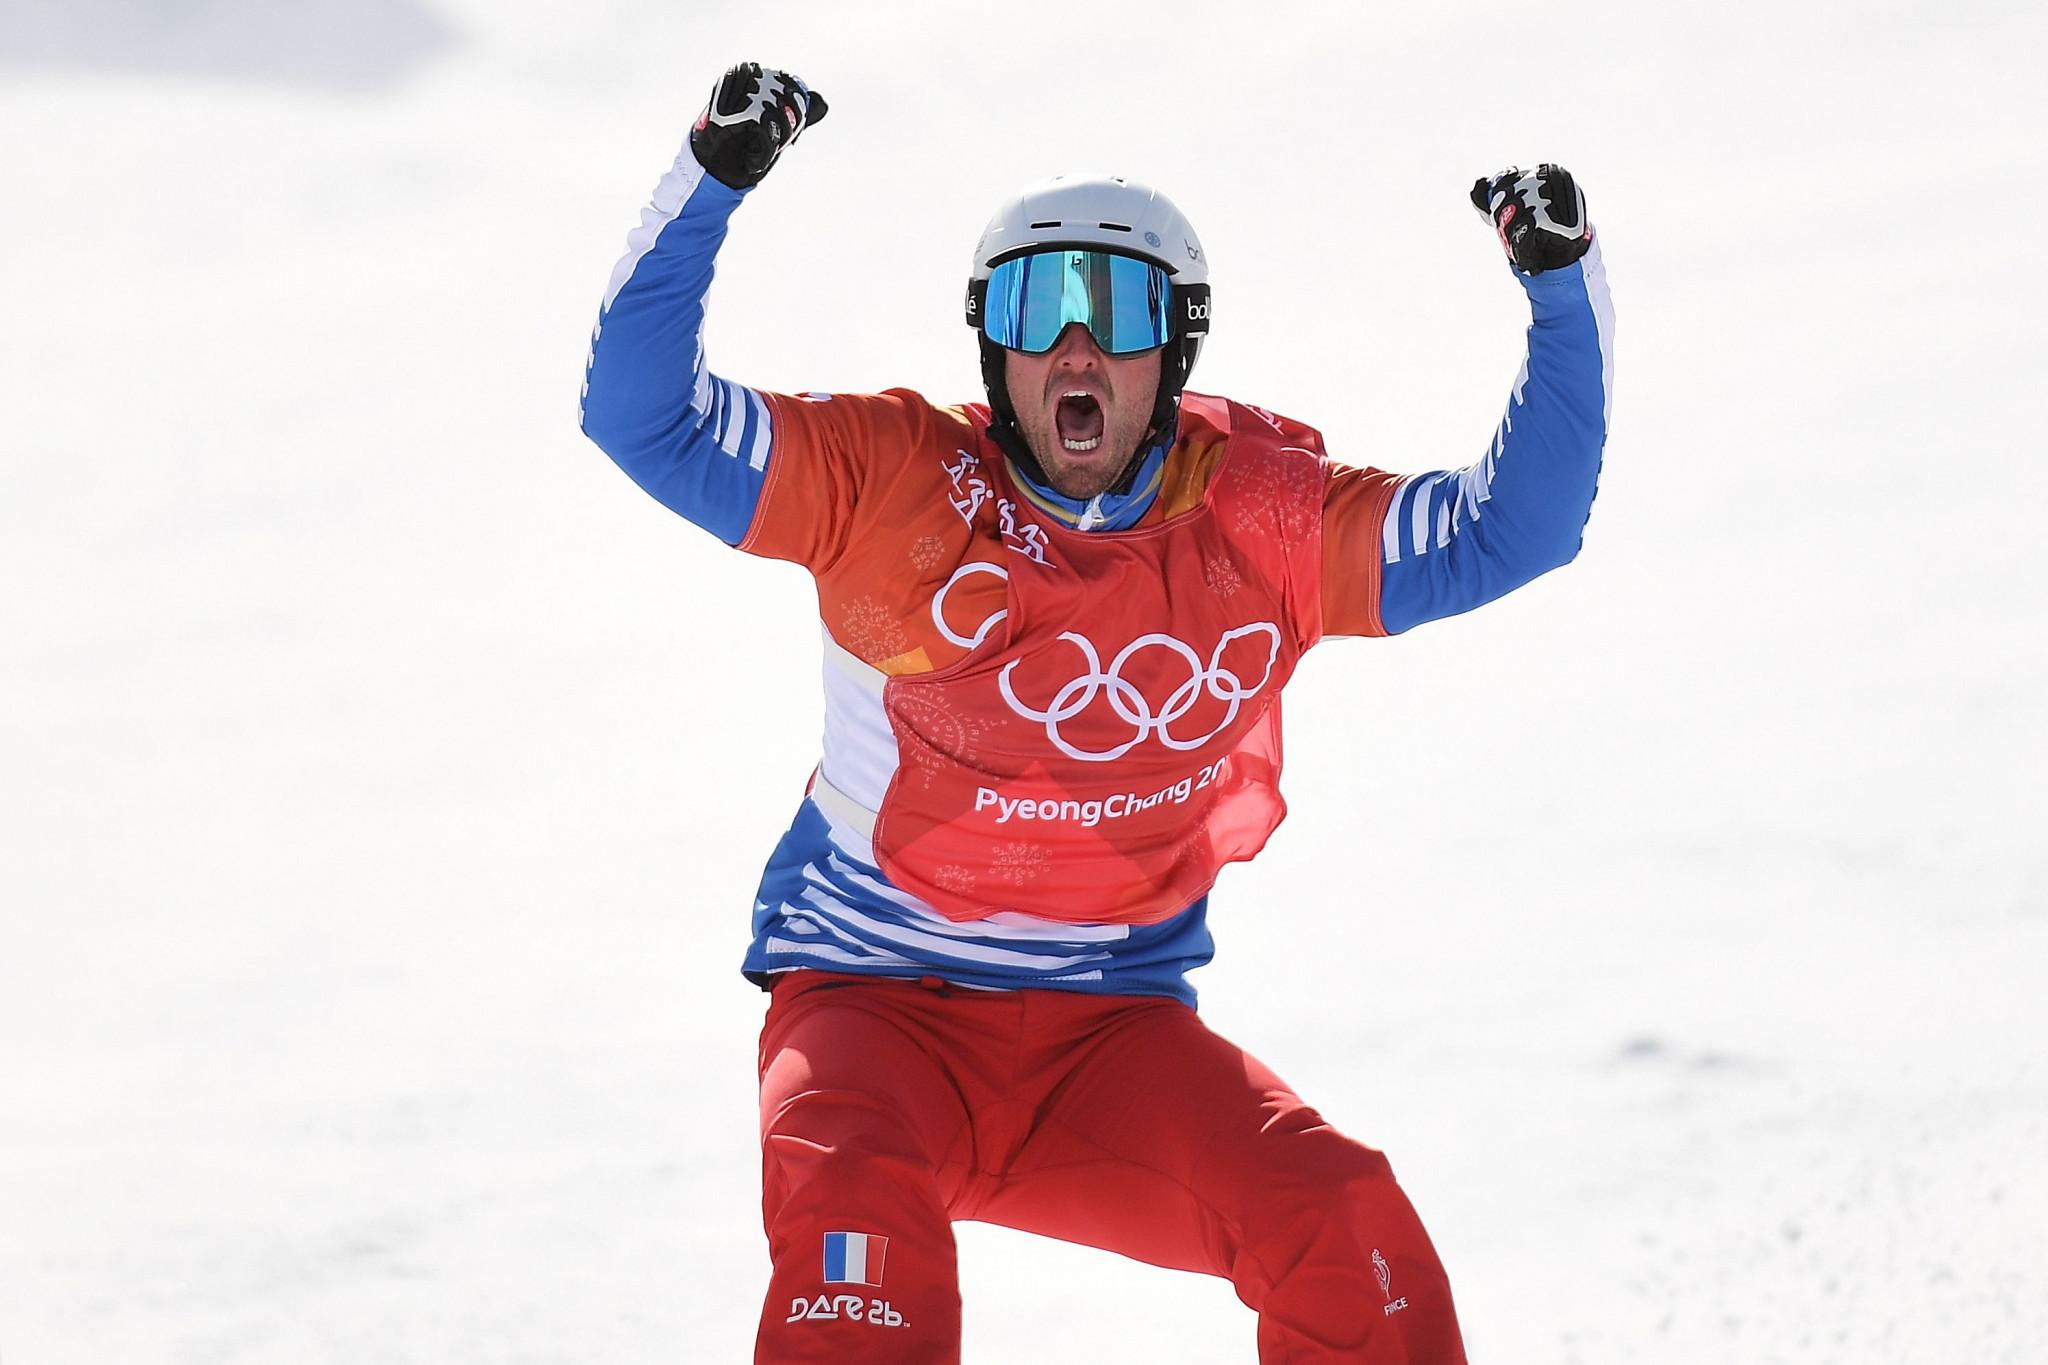 Double Olympic snowboard cross champion Vaultier announces retirement